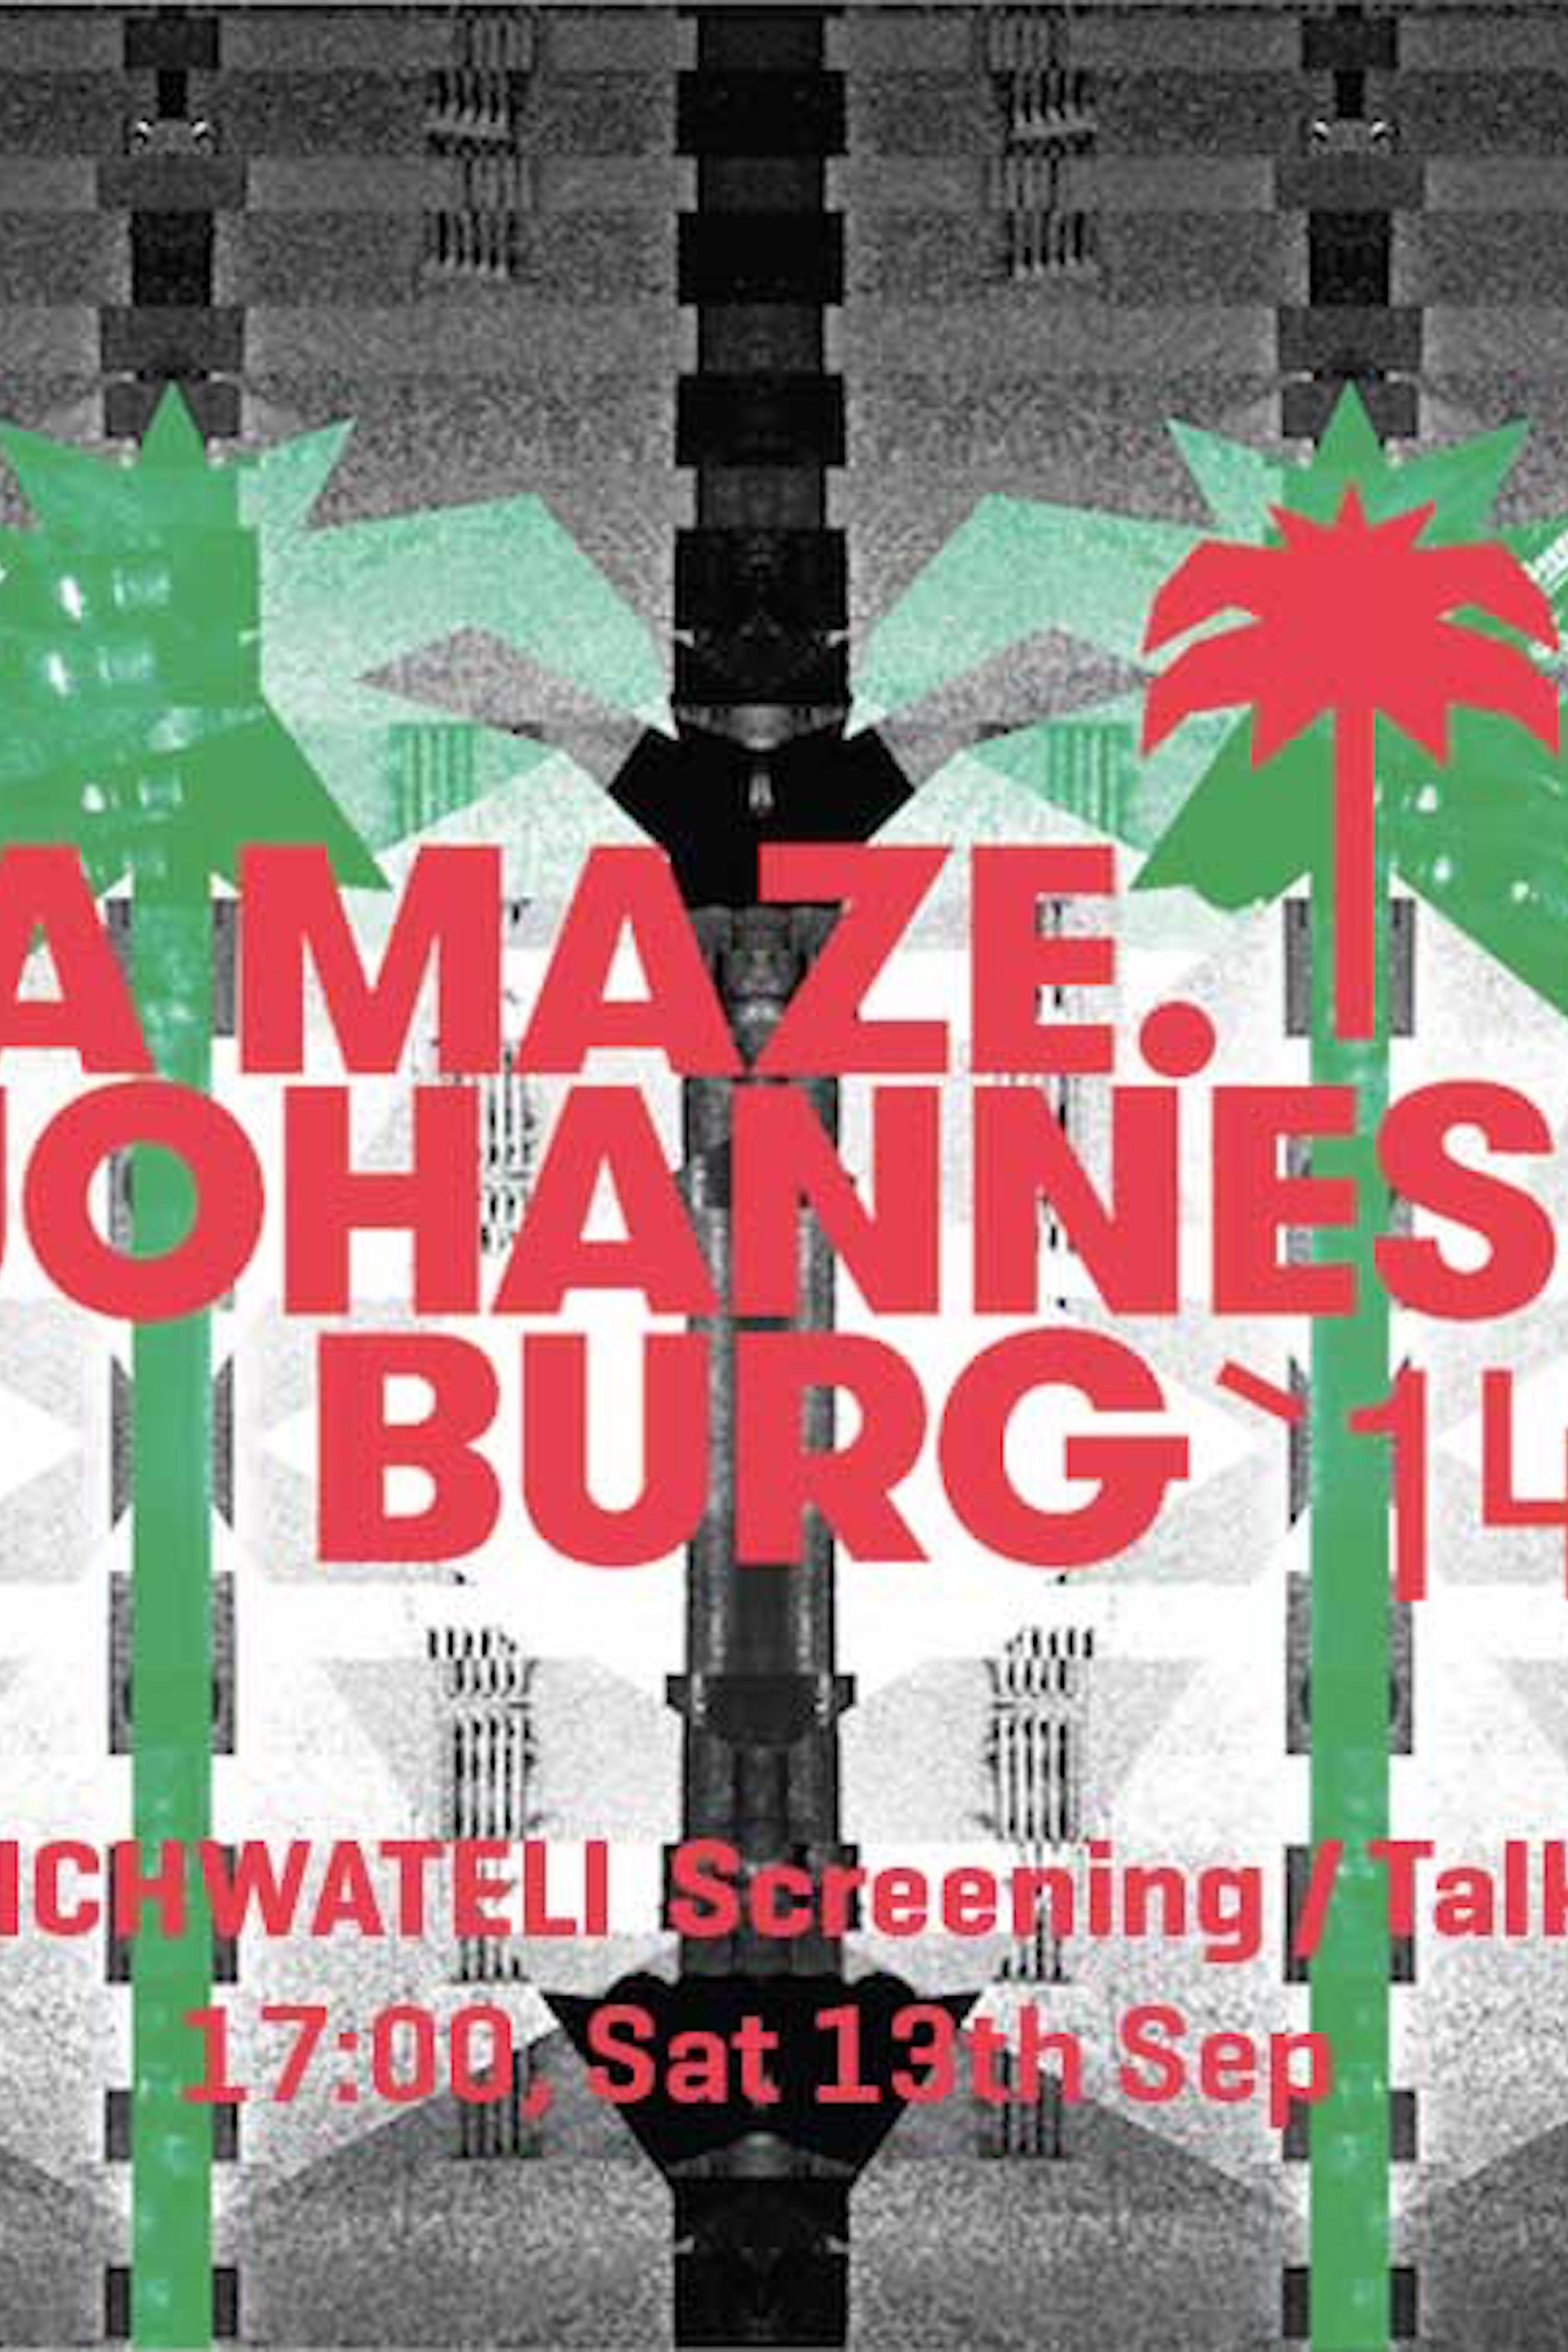 A MAZE.: Johannes-burg '14 Exhibition